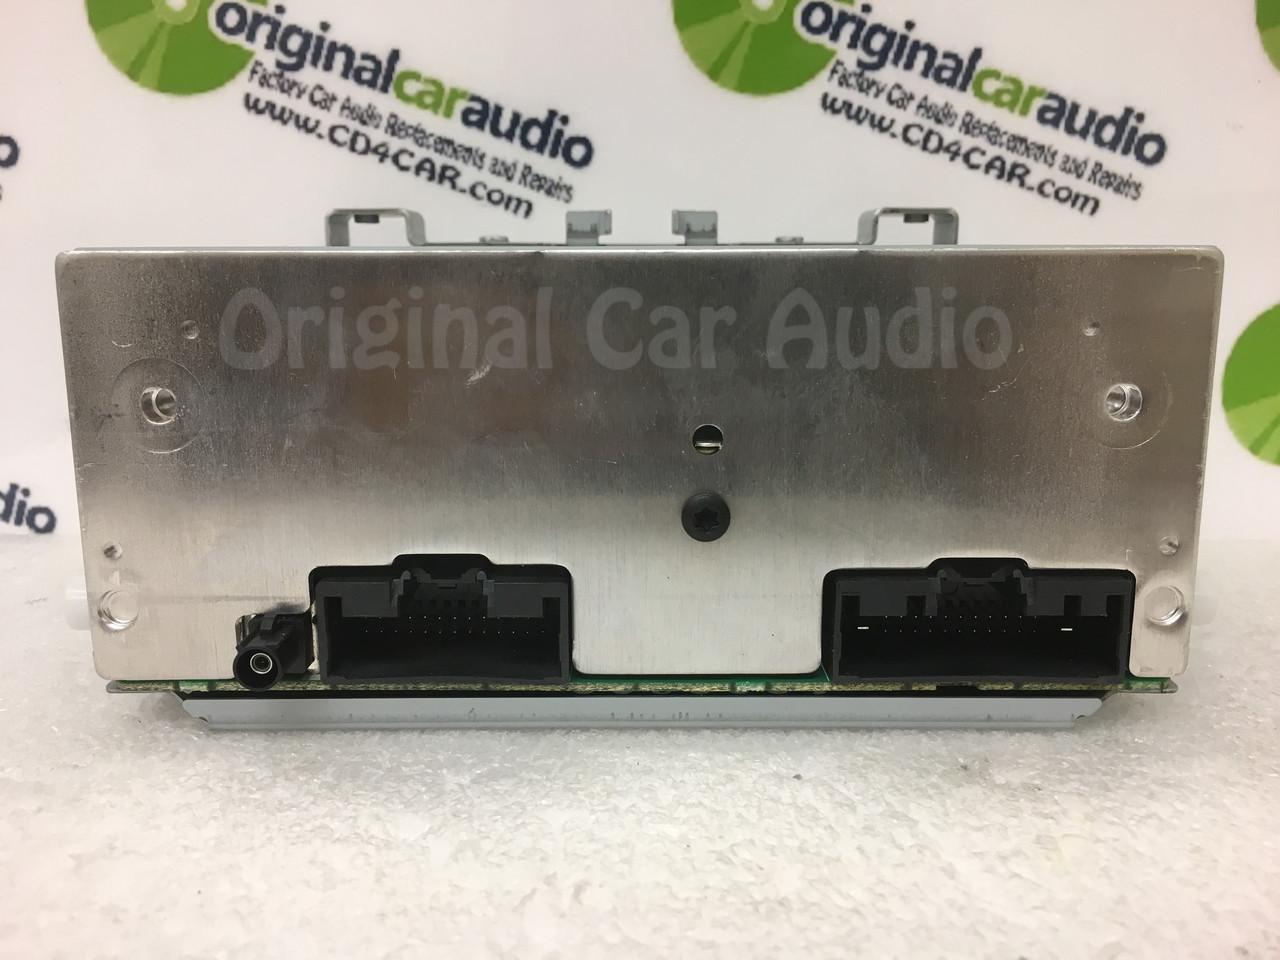 11 12 13 Ford FIESTA OEM RADIO AM-FM CD MP3 Satellite Receiver